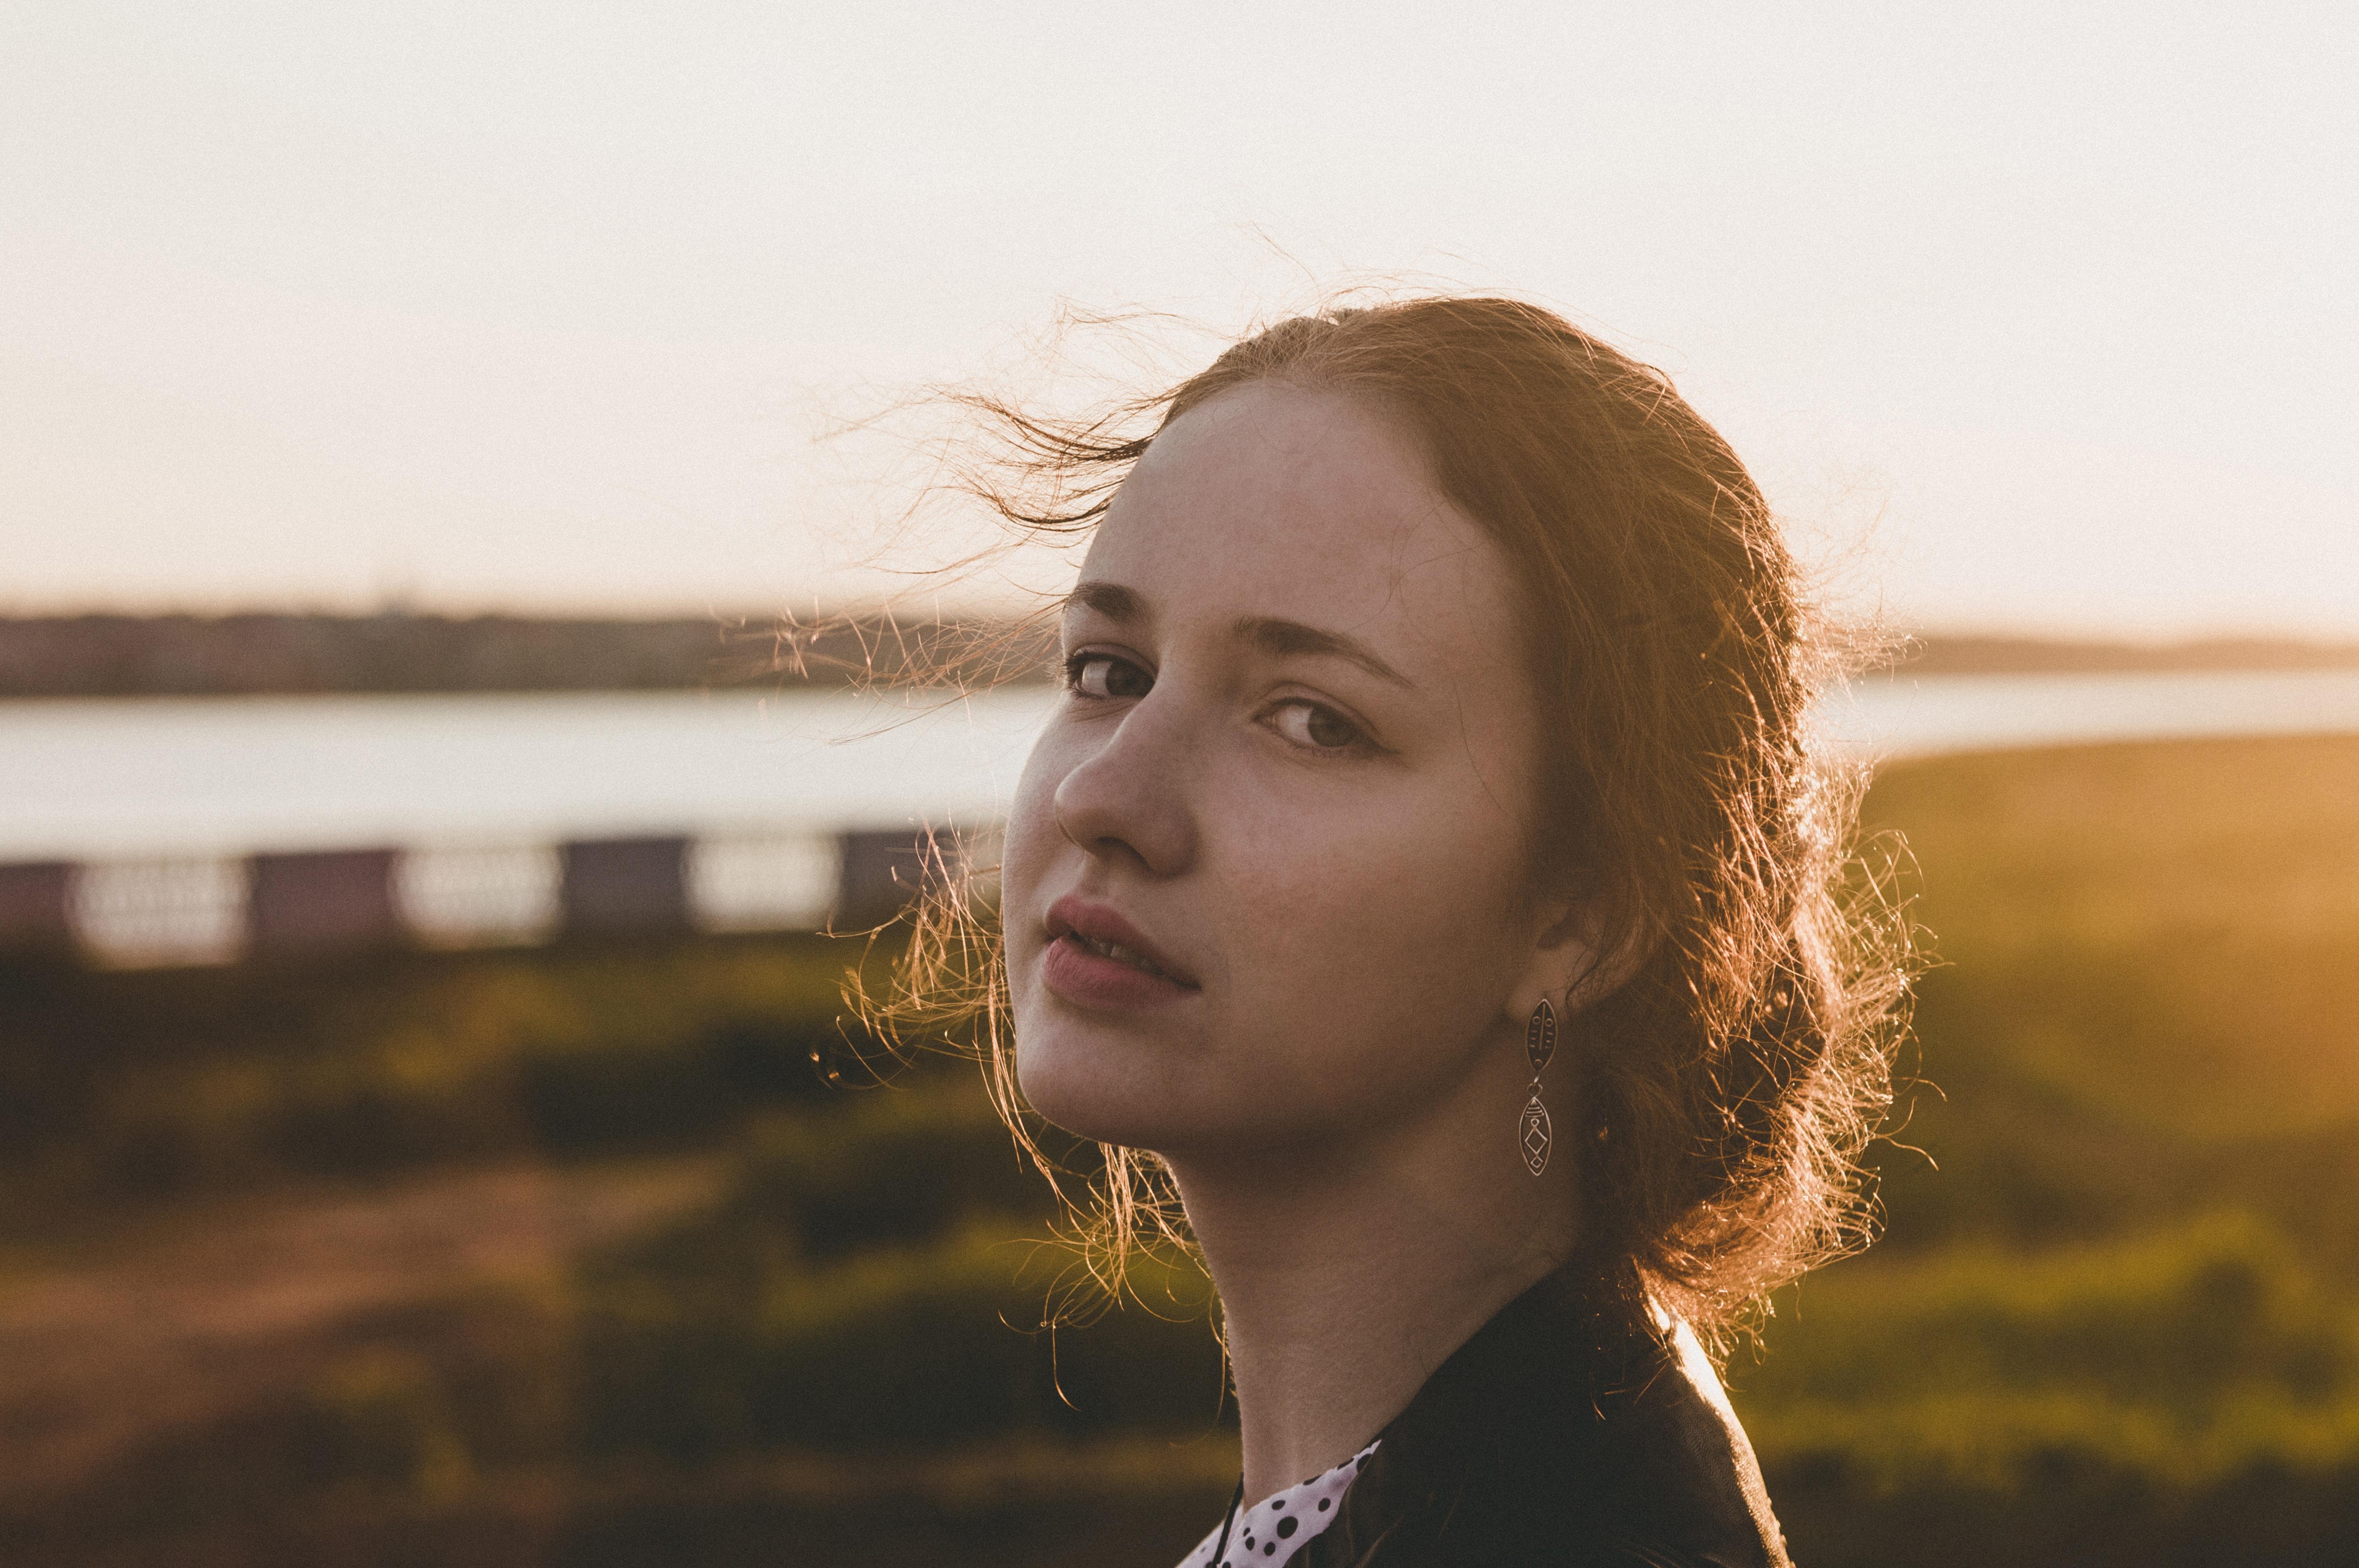 Tilt shift lens photography of woman during sunset